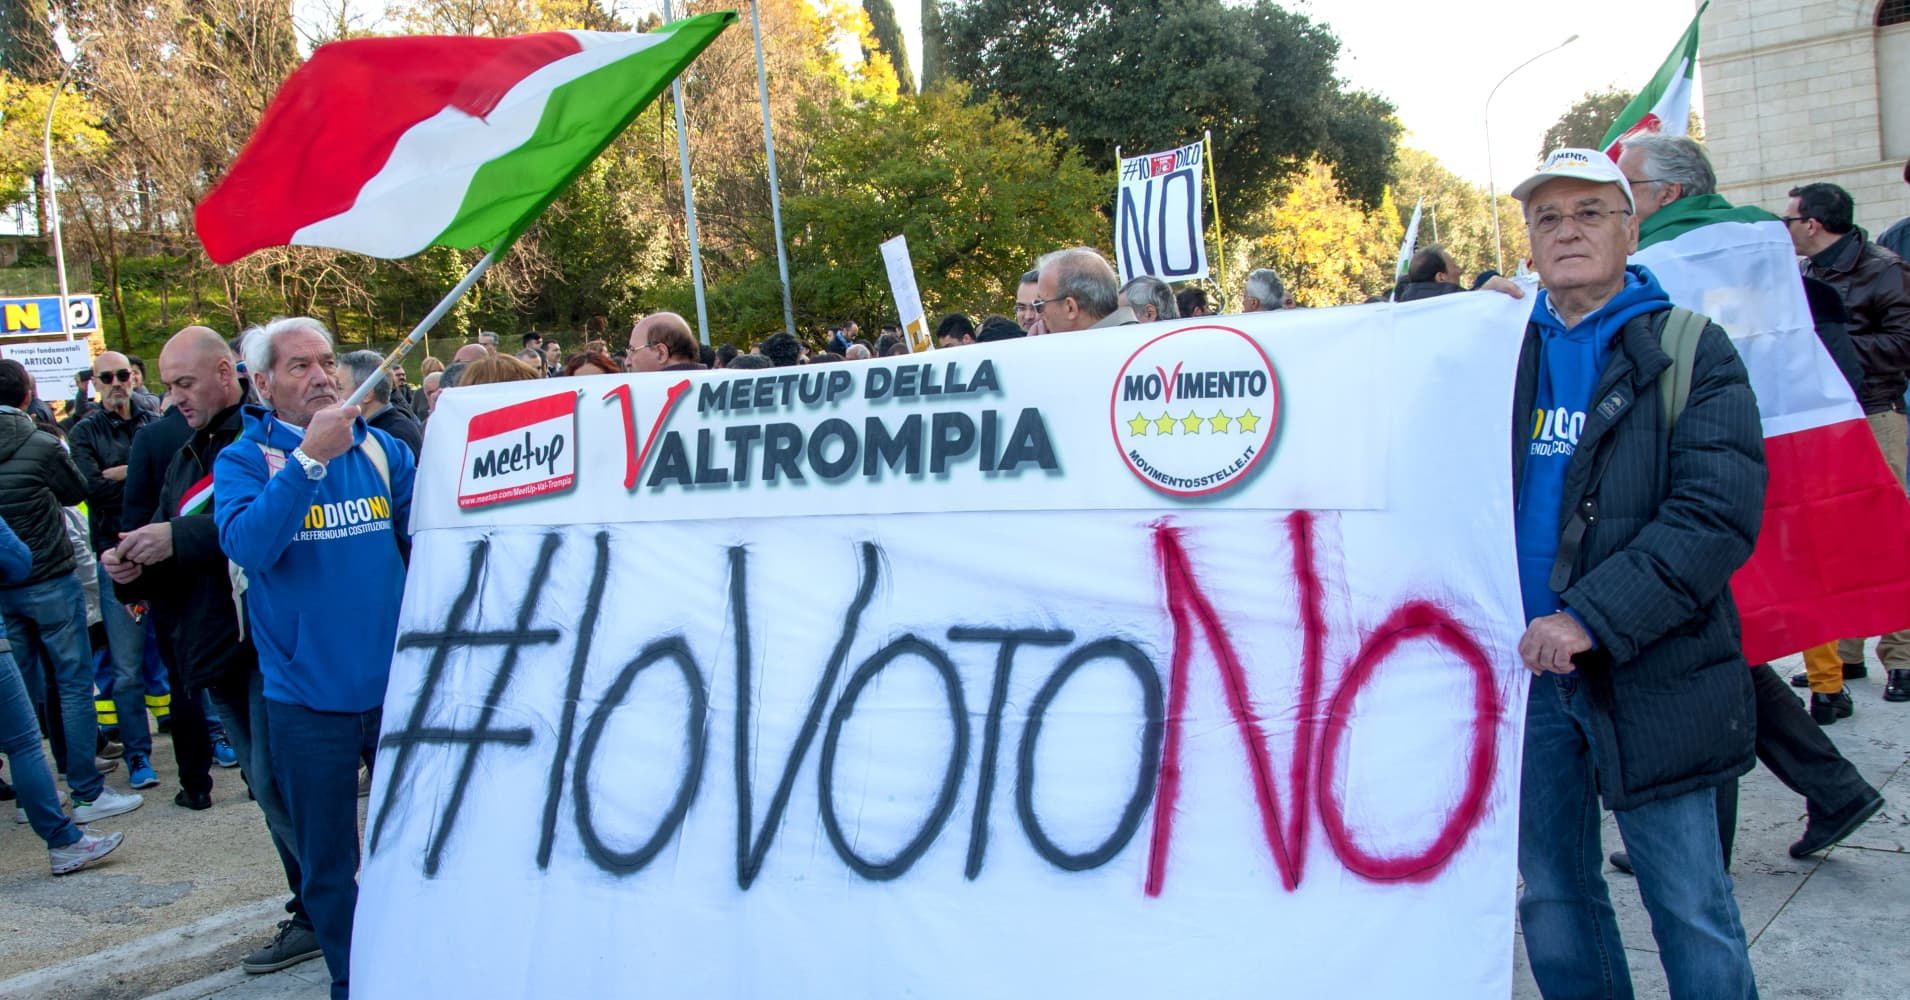 Live: European stocks slip as markets get edgy ahead of Italian referendum